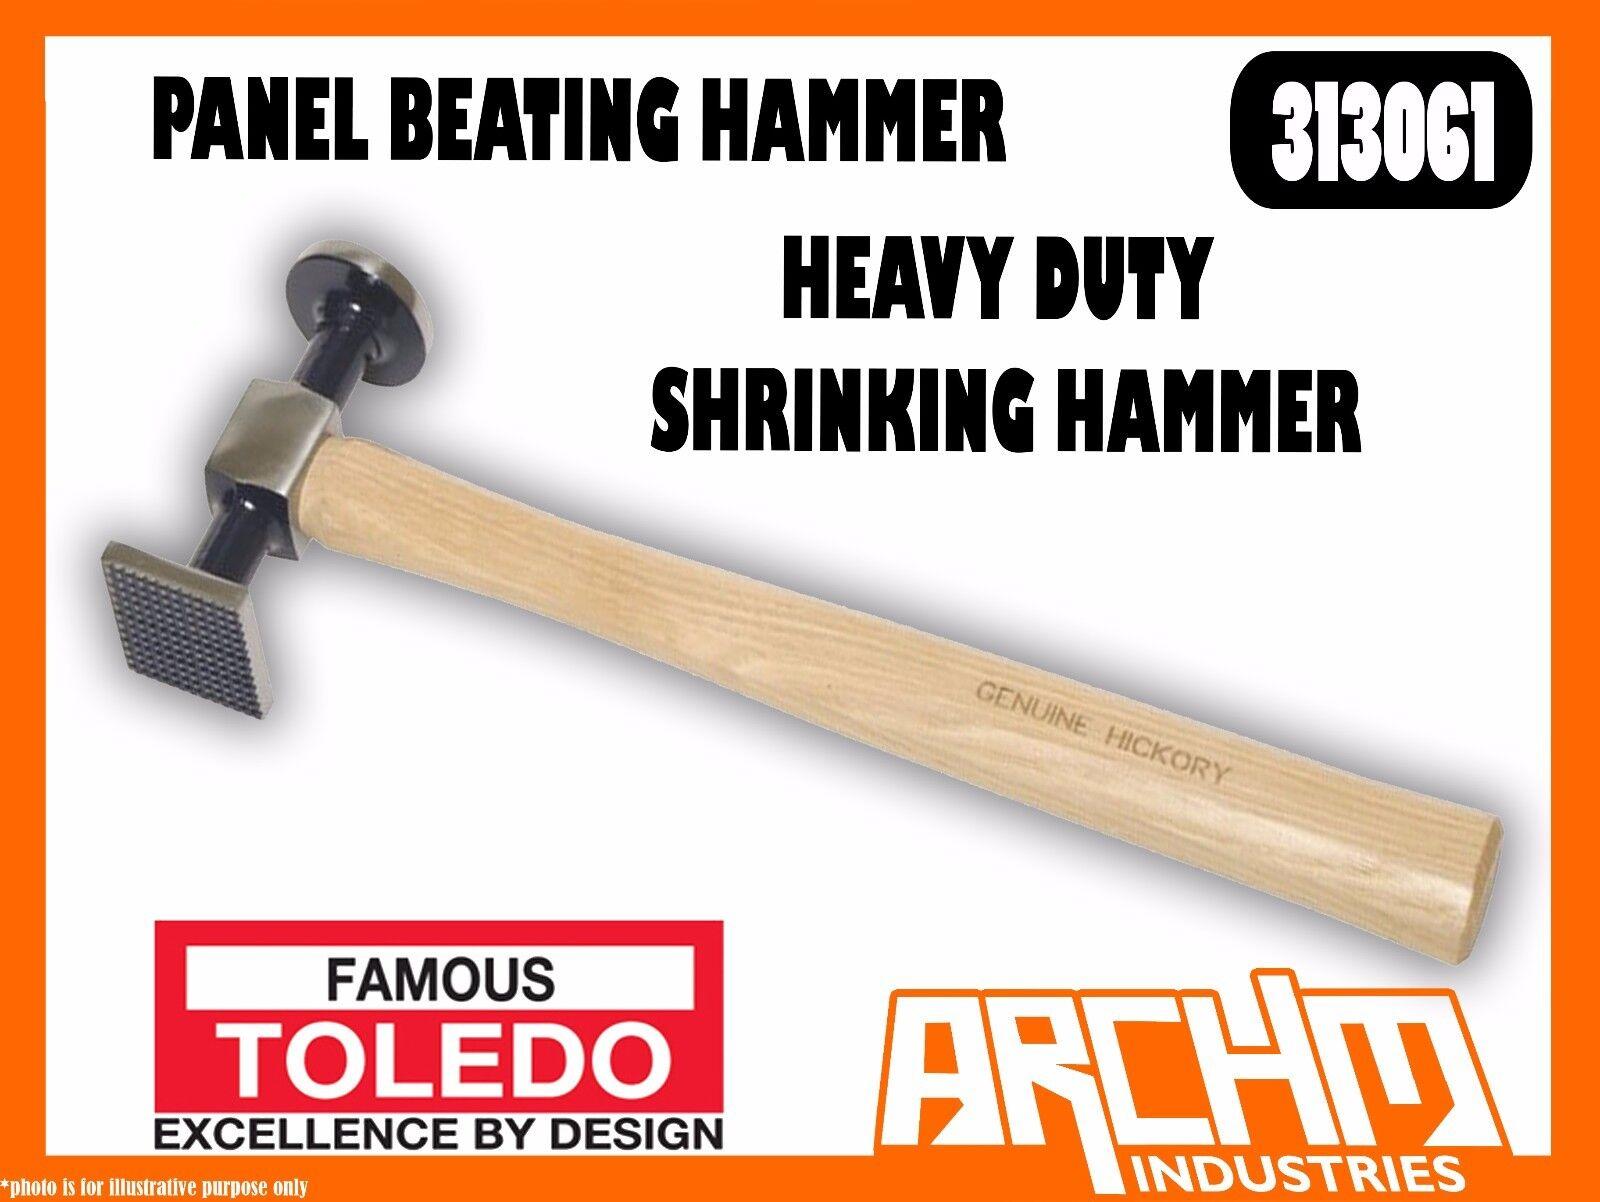 TOLEDO 313061 - PANEL BEATING HAMMER - HEAVY DUTY SHRINKING HAMMER